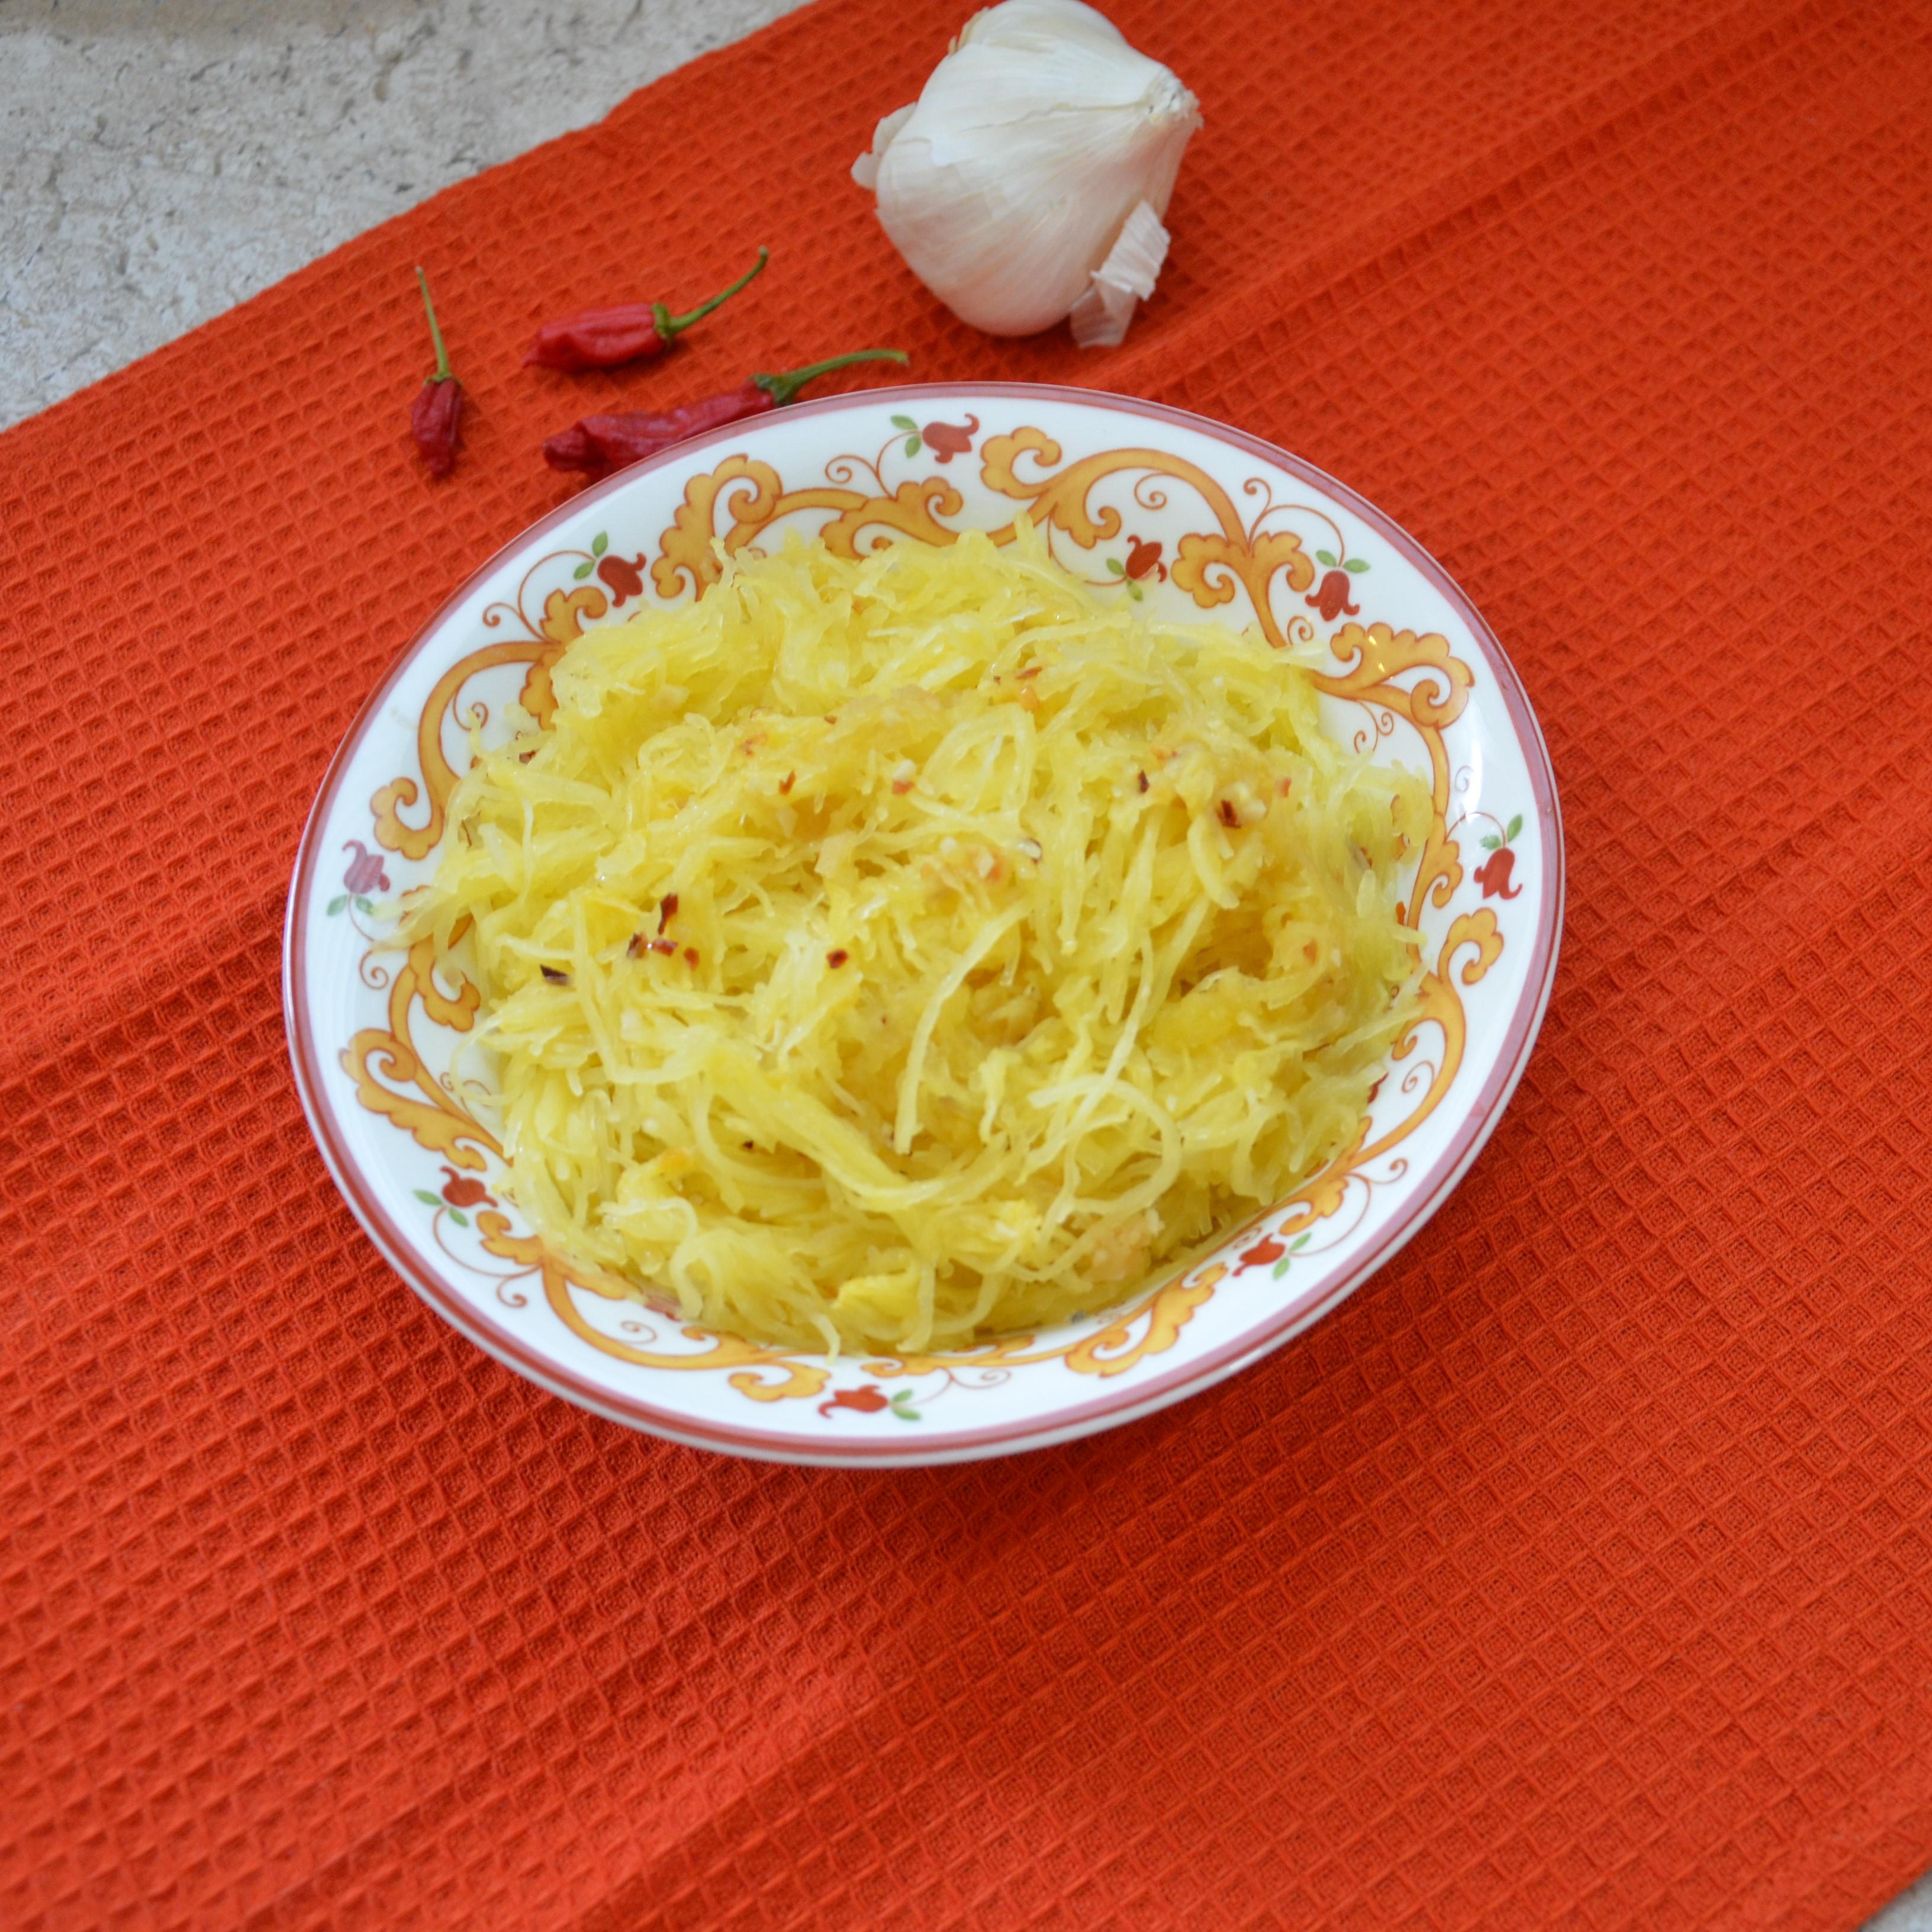 Garlic-Ginger Roasted Spaghetti Squash